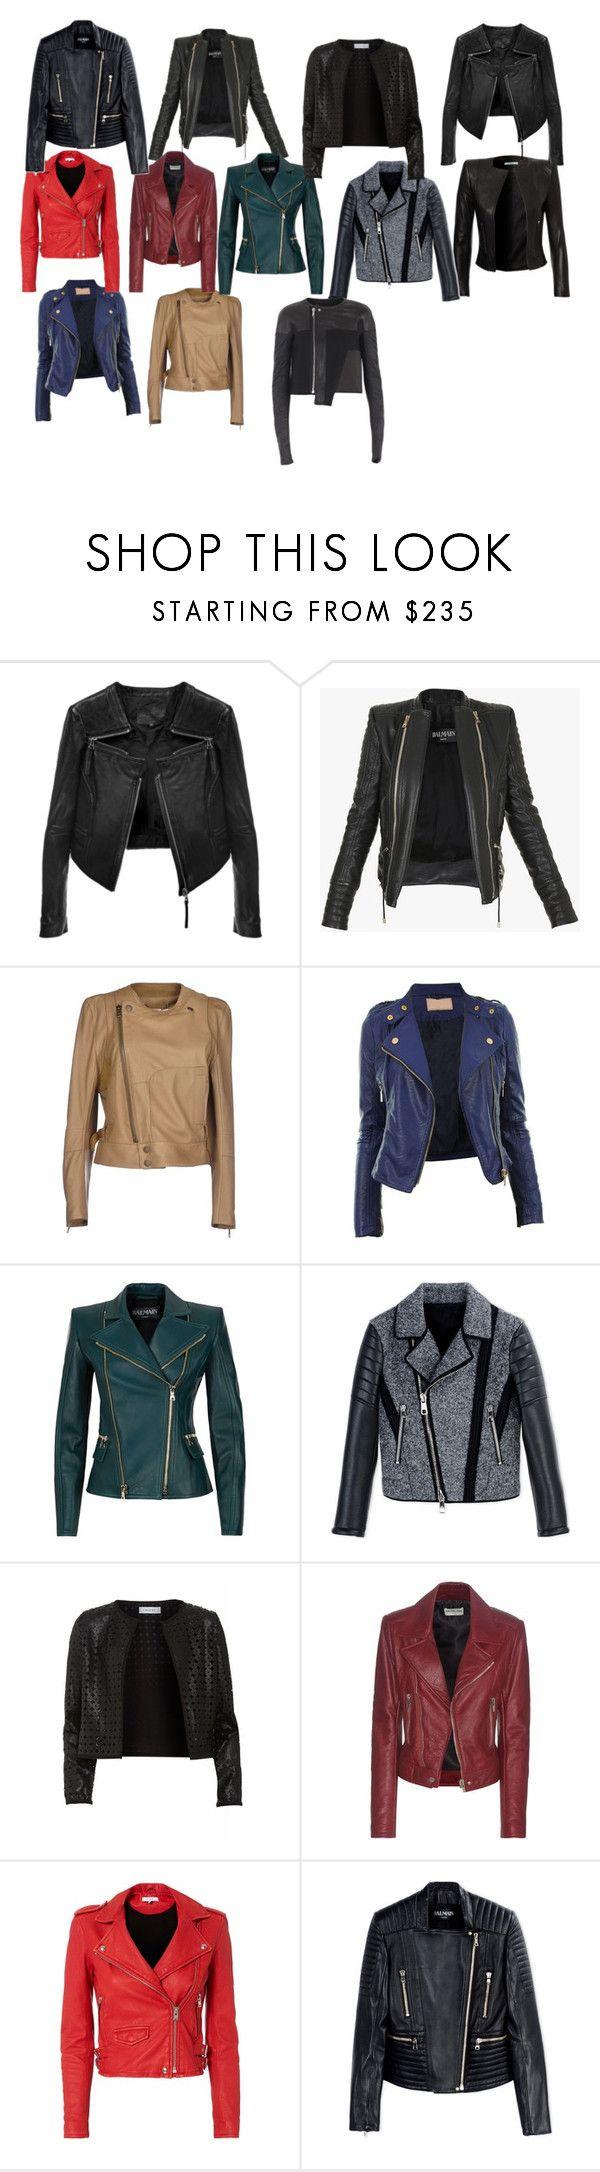 """Leather jackets"" by azra-99 on Polyvore featuring Linea Pelle, Balmain, Chloé, Neil Barrett, Maglie I Blues, Balenciaga, IRO and Rick Owens"